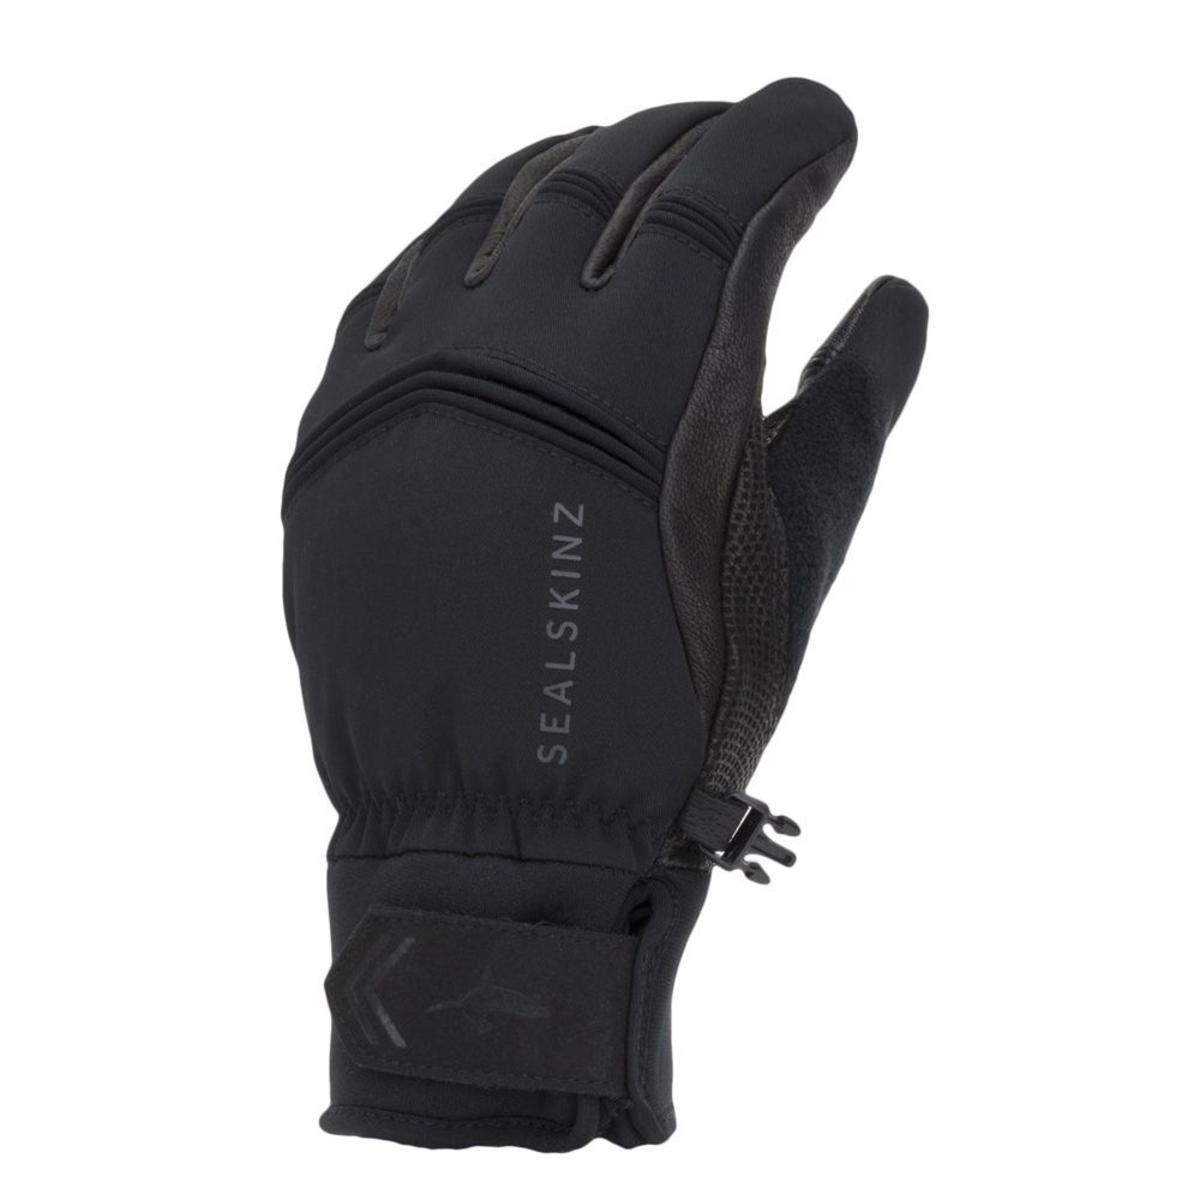 SealSkinz Men's Waterproof Extreme Cold Weather Gloves   eBay